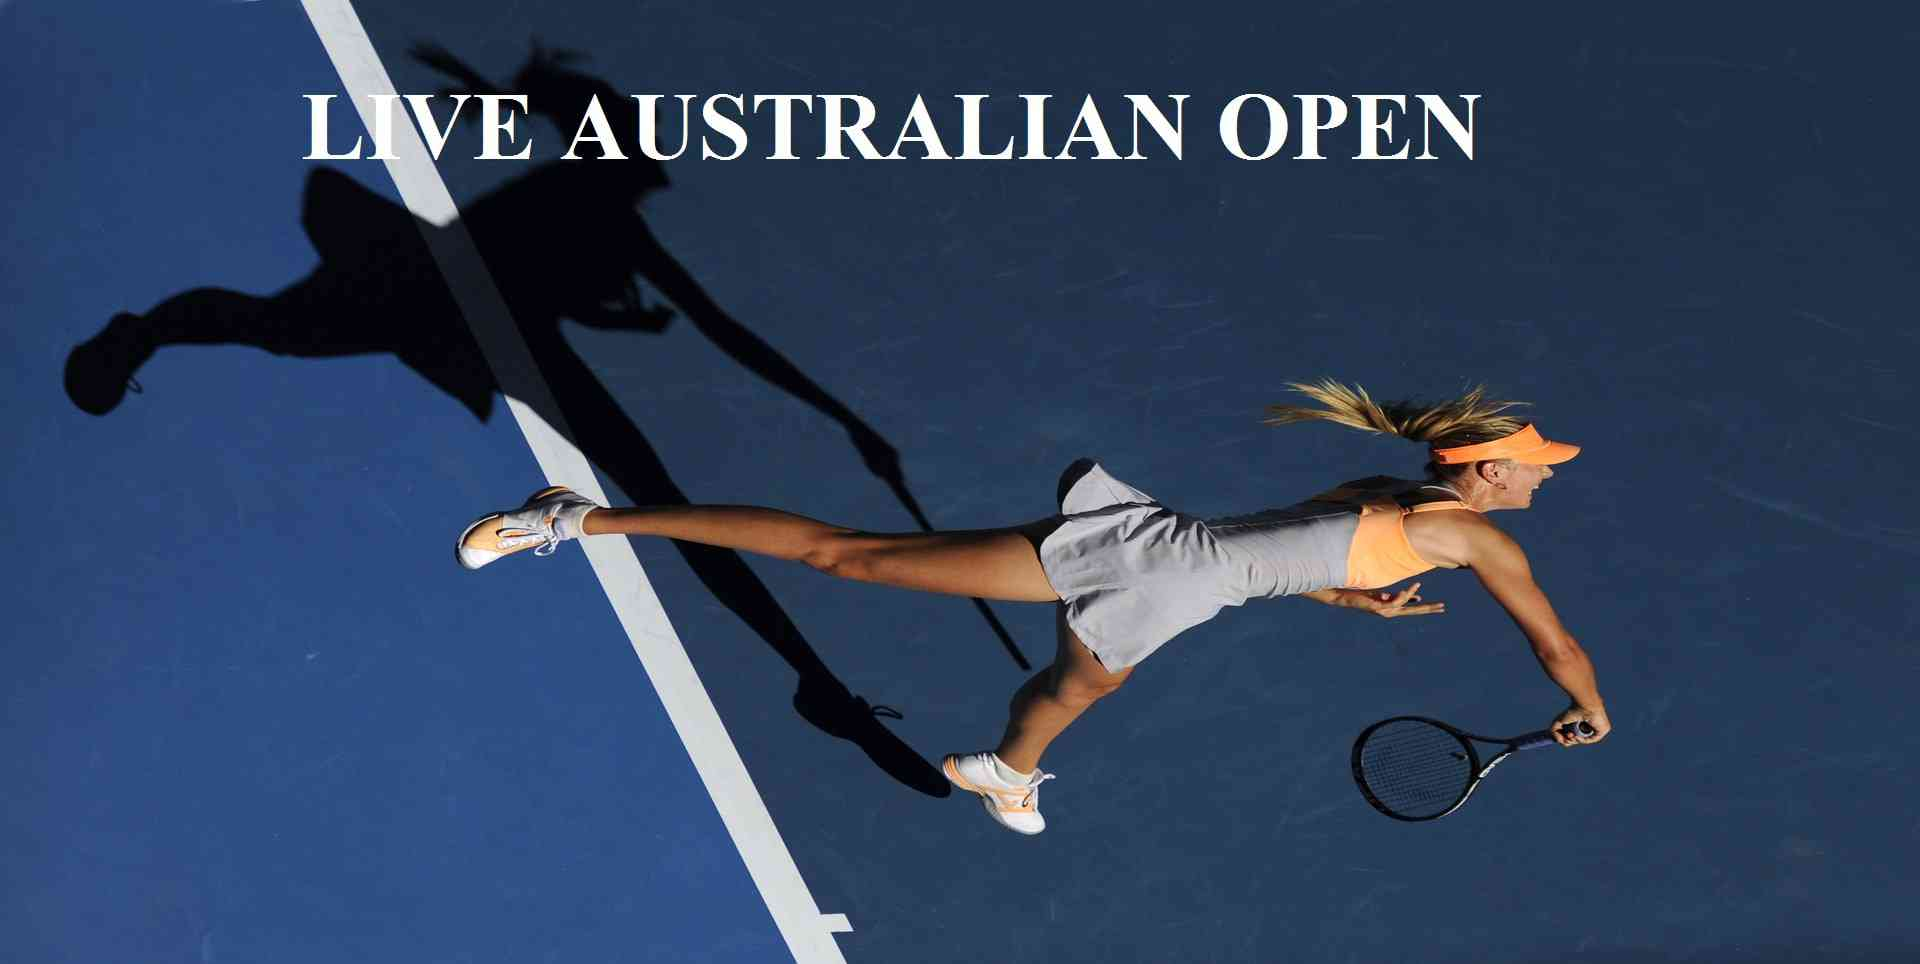 Australian Open 2017 round 4 live